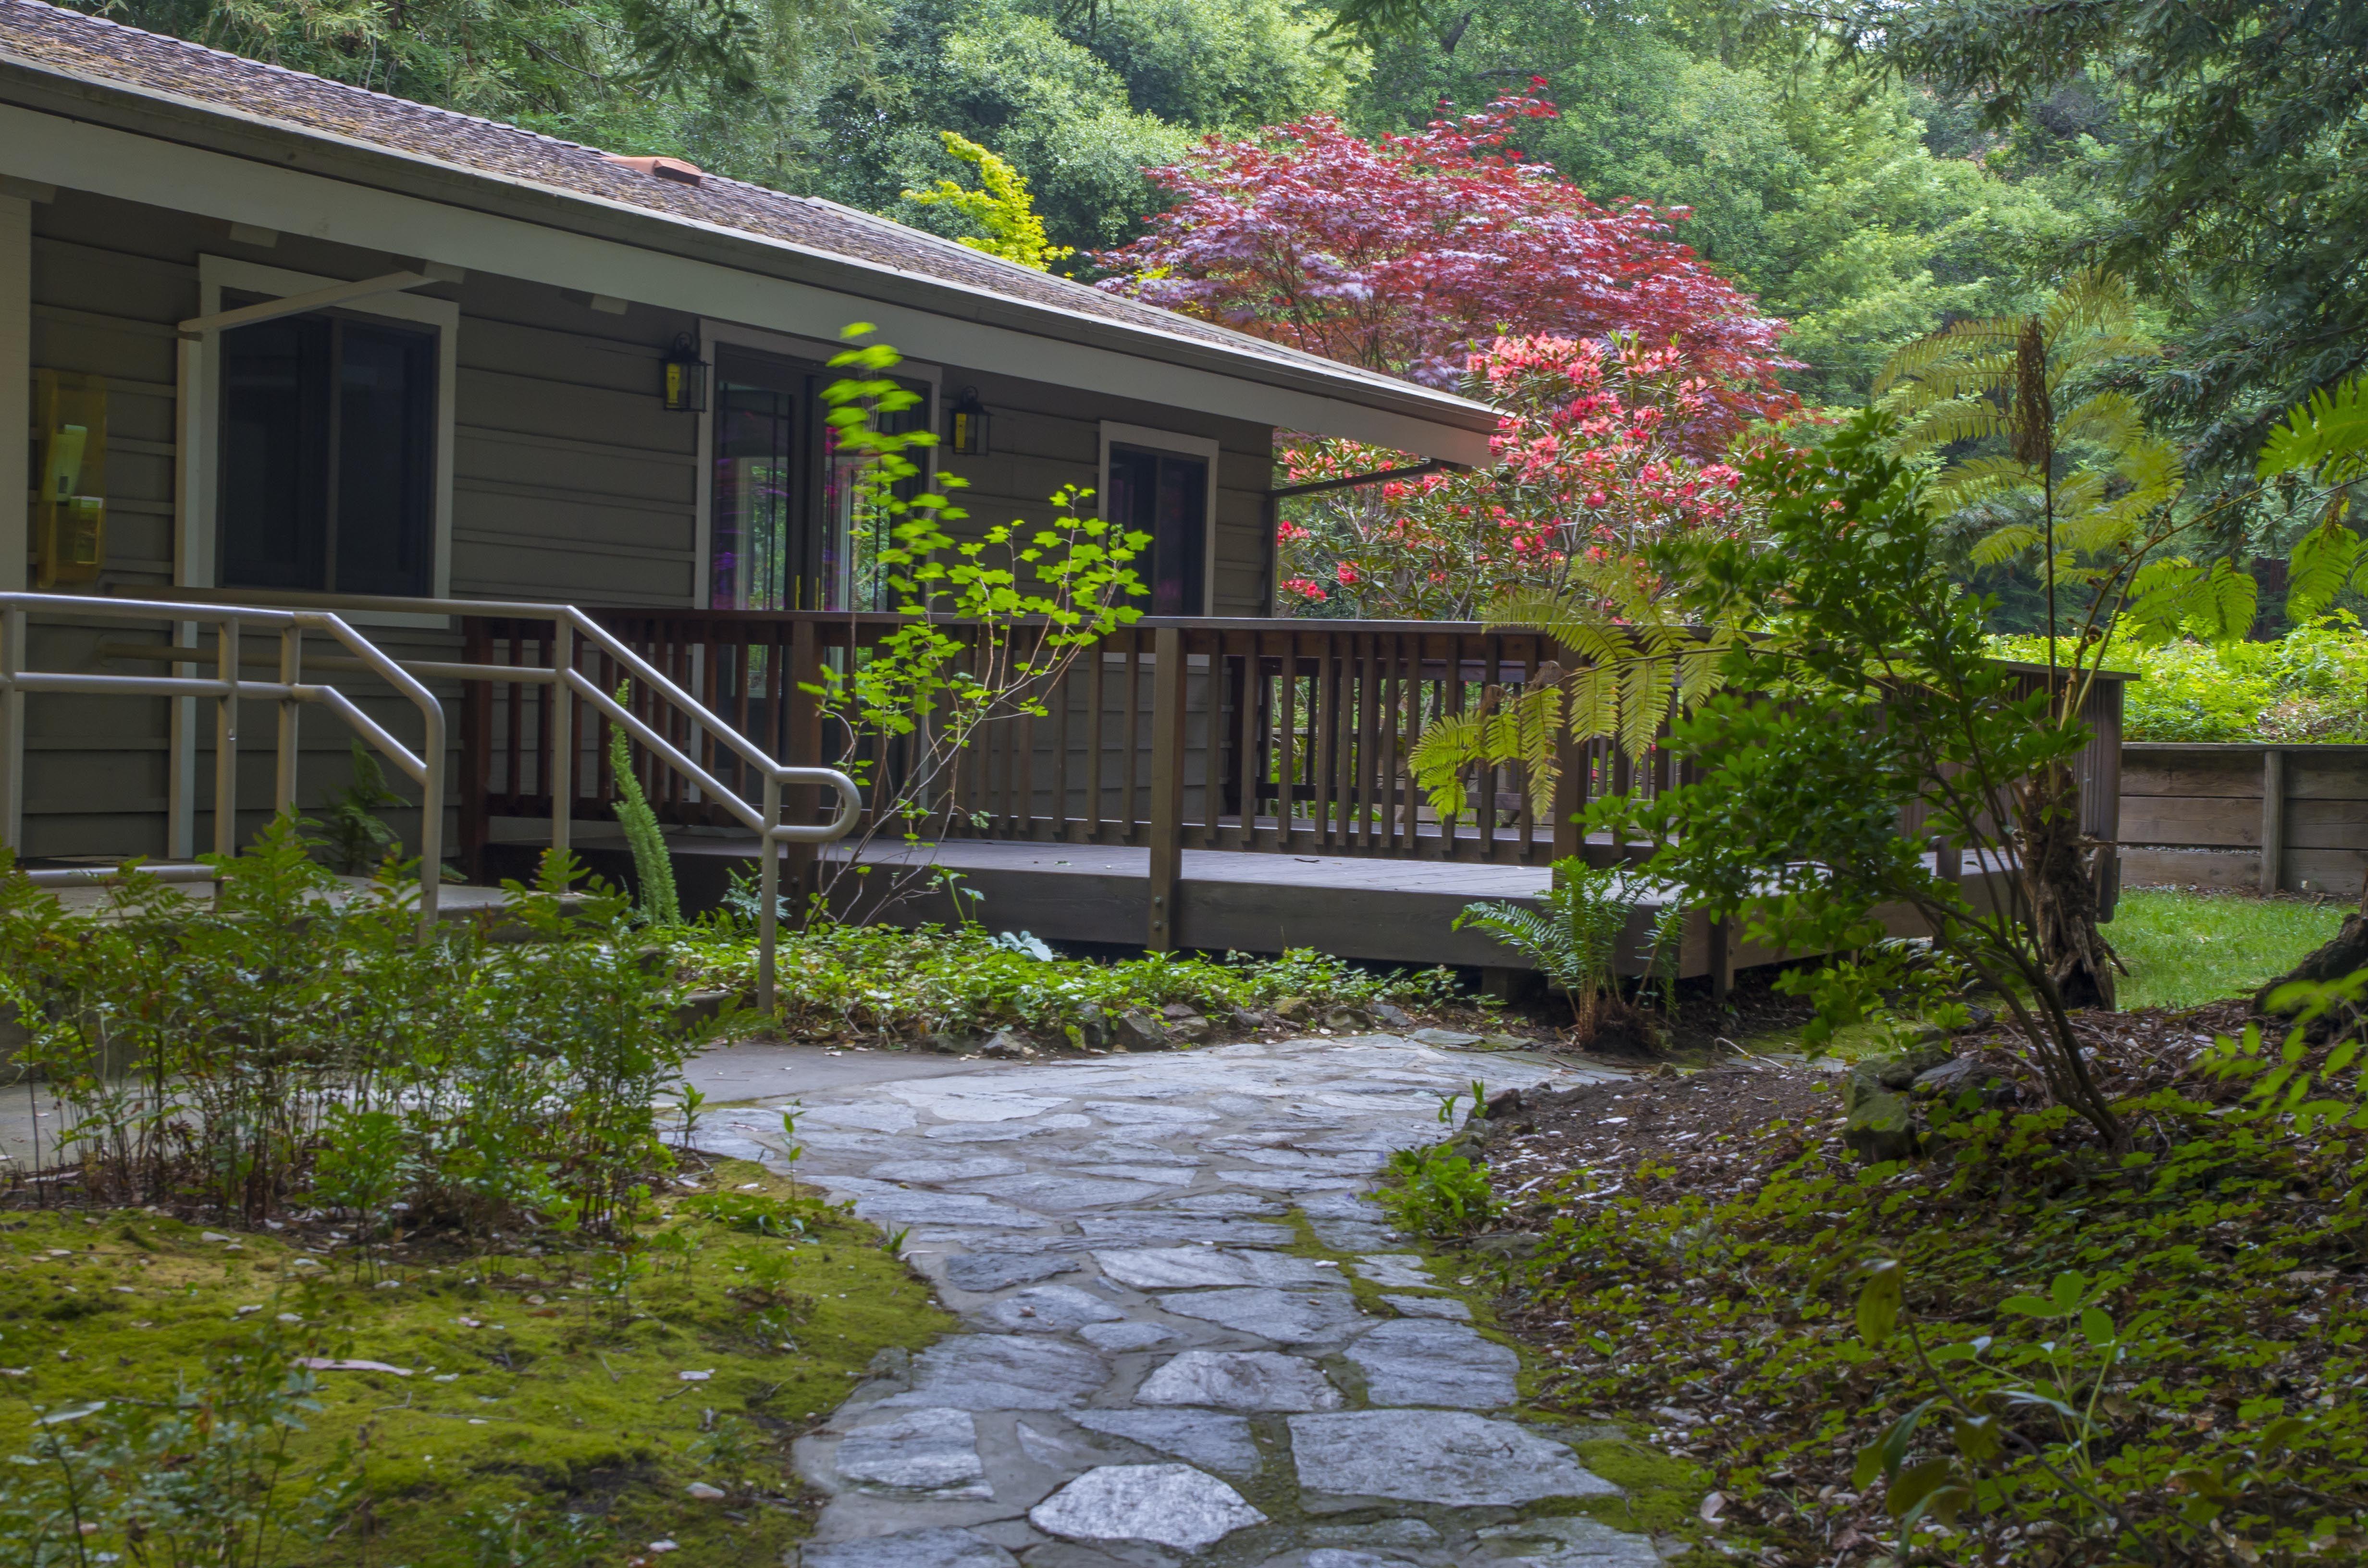 fern cottage kennedy grove regional recreation area el. Black Bedroom Furniture Sets. Home Design Ideas